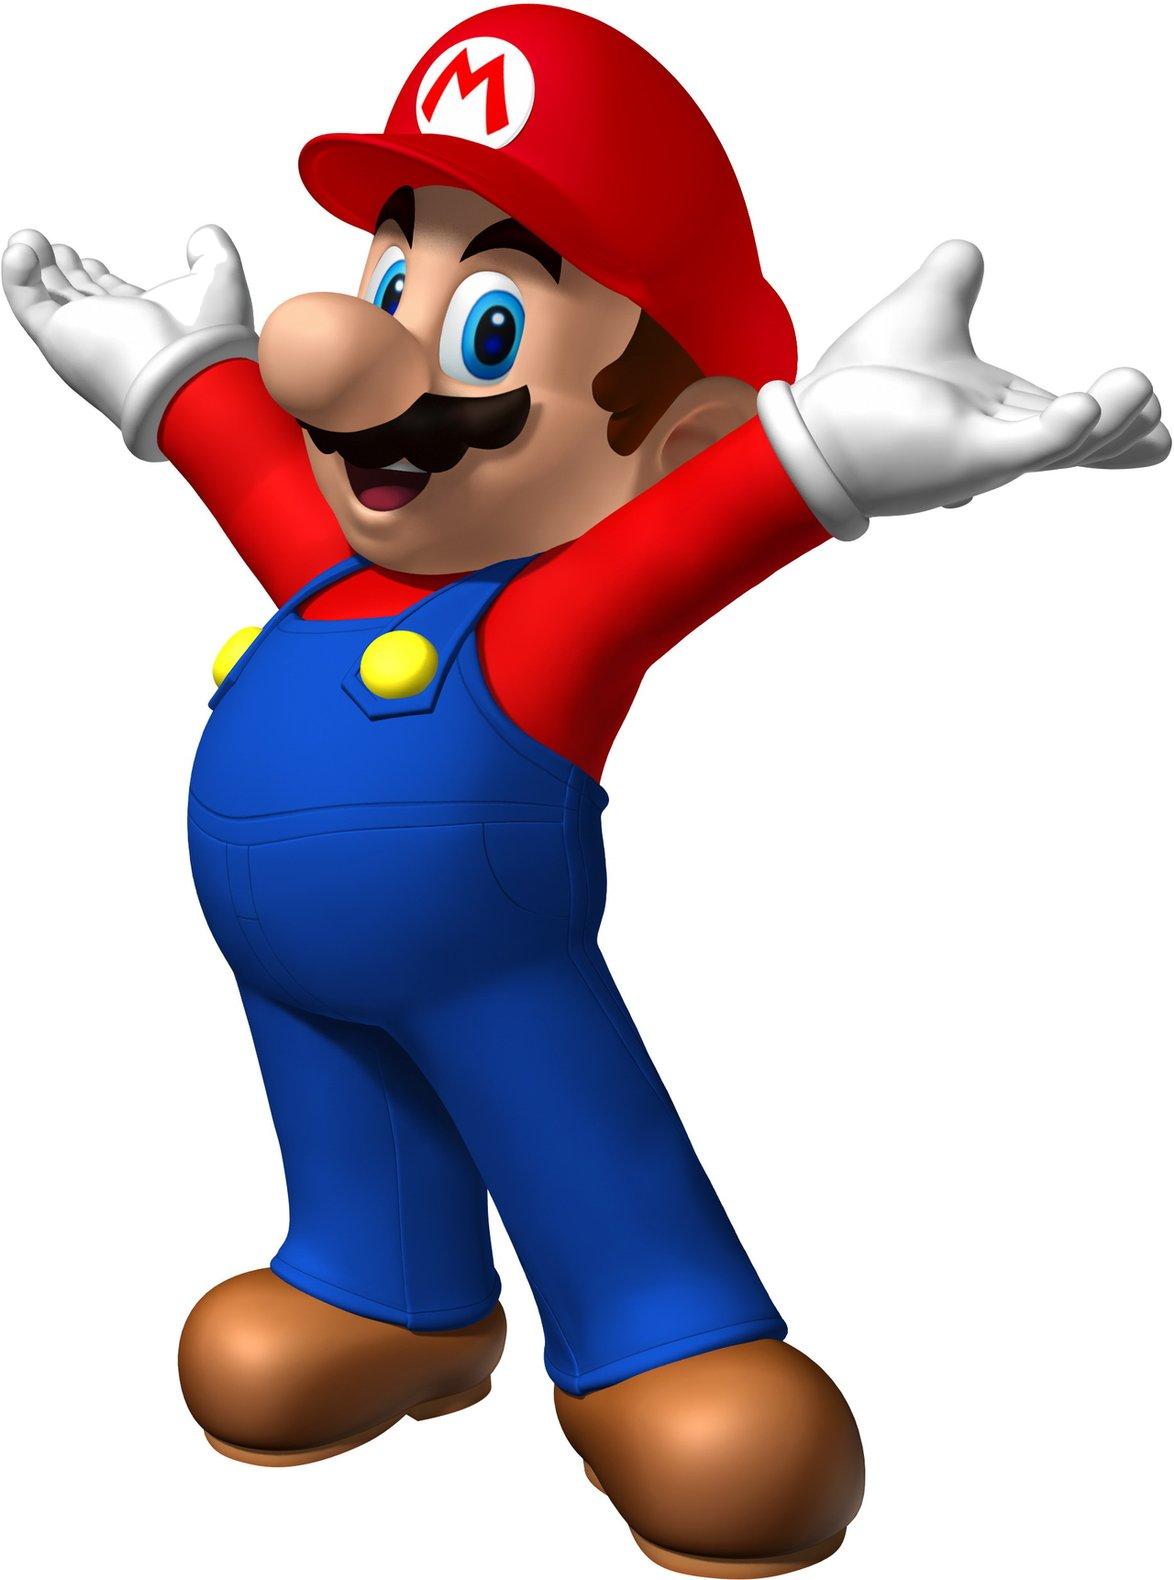 Mario character nintendo